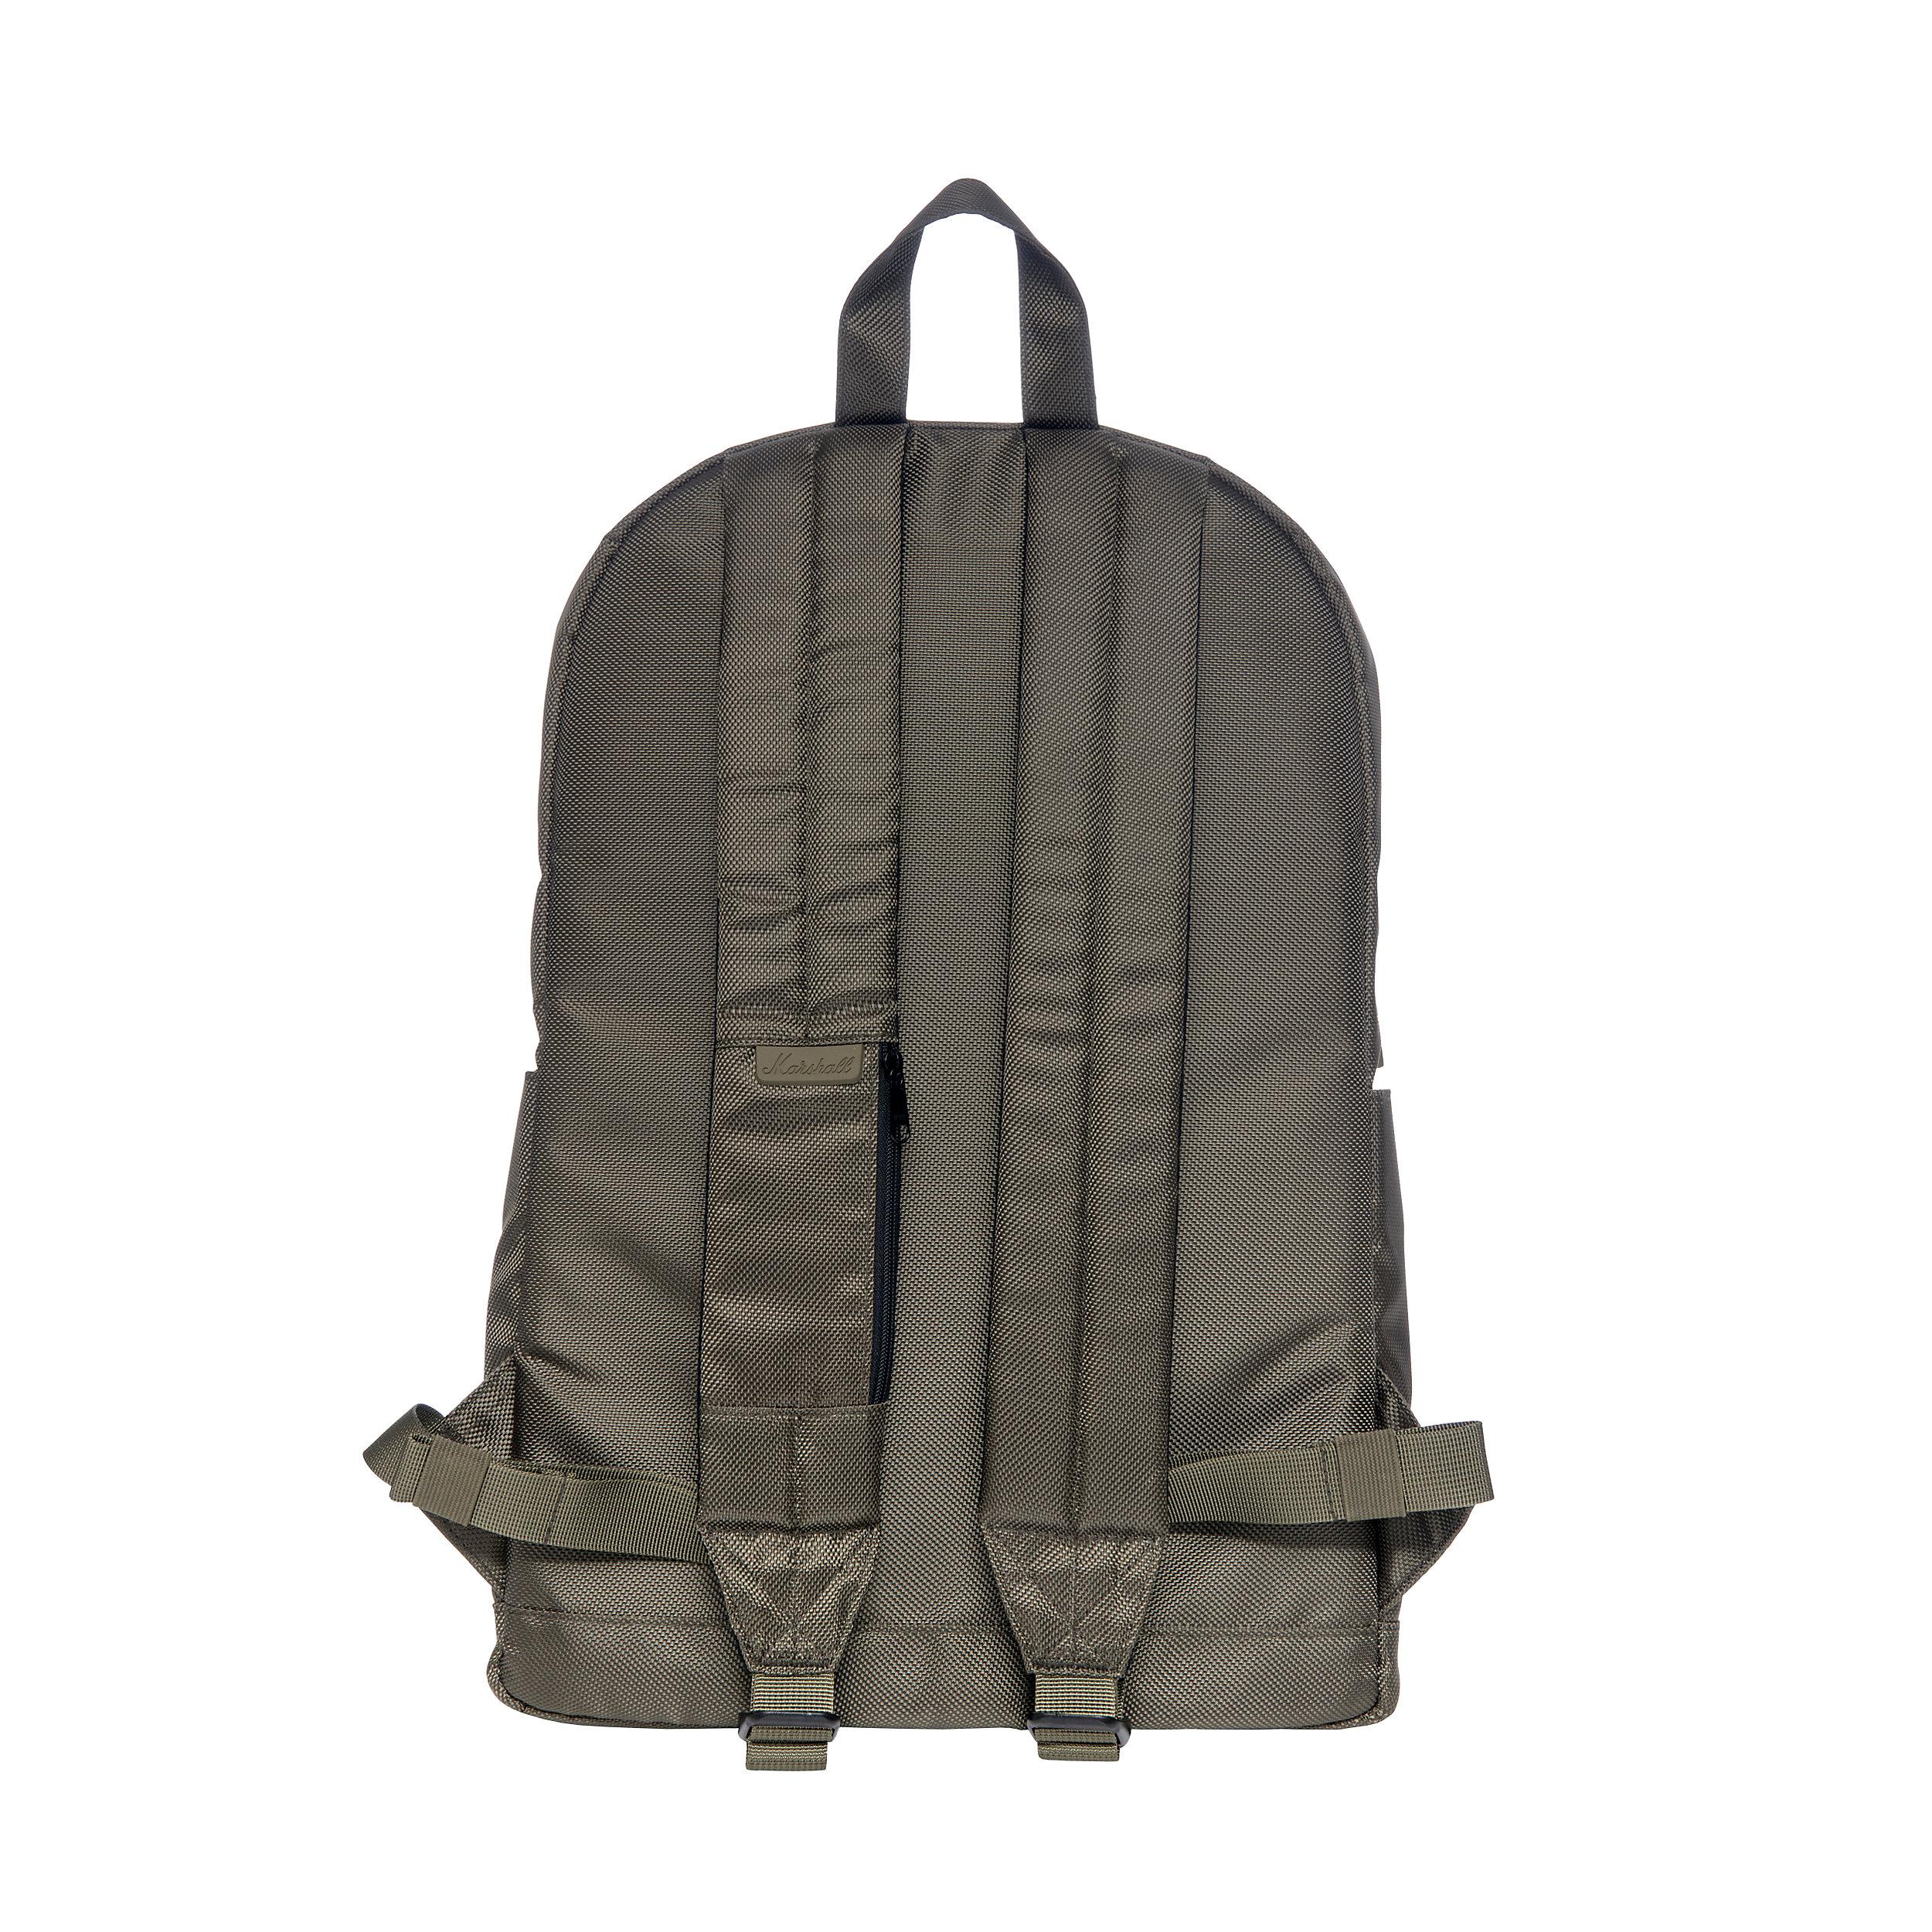 Backpack Crosstown 15 inch L 22 Liter